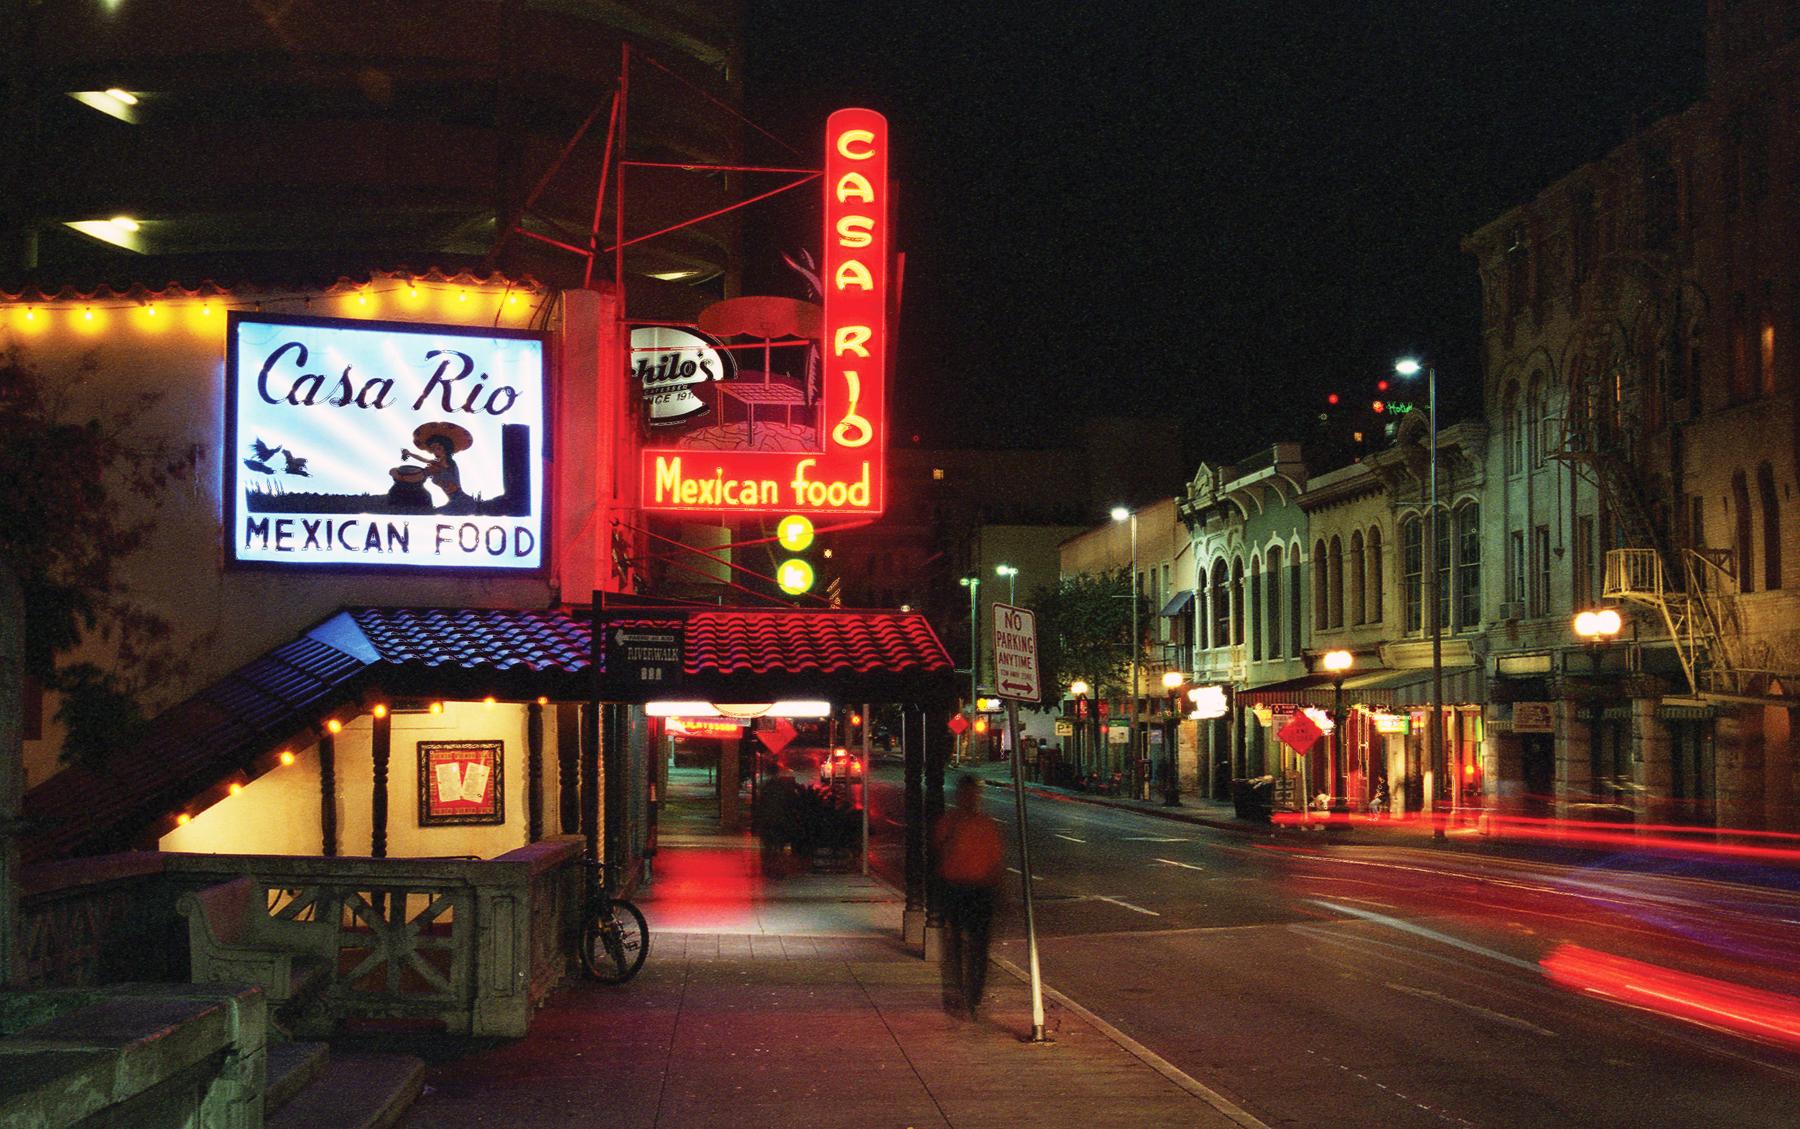 Commerce Street San Antonio | Nikon N80 | Kodak GC 400 8 | Barbara Justice